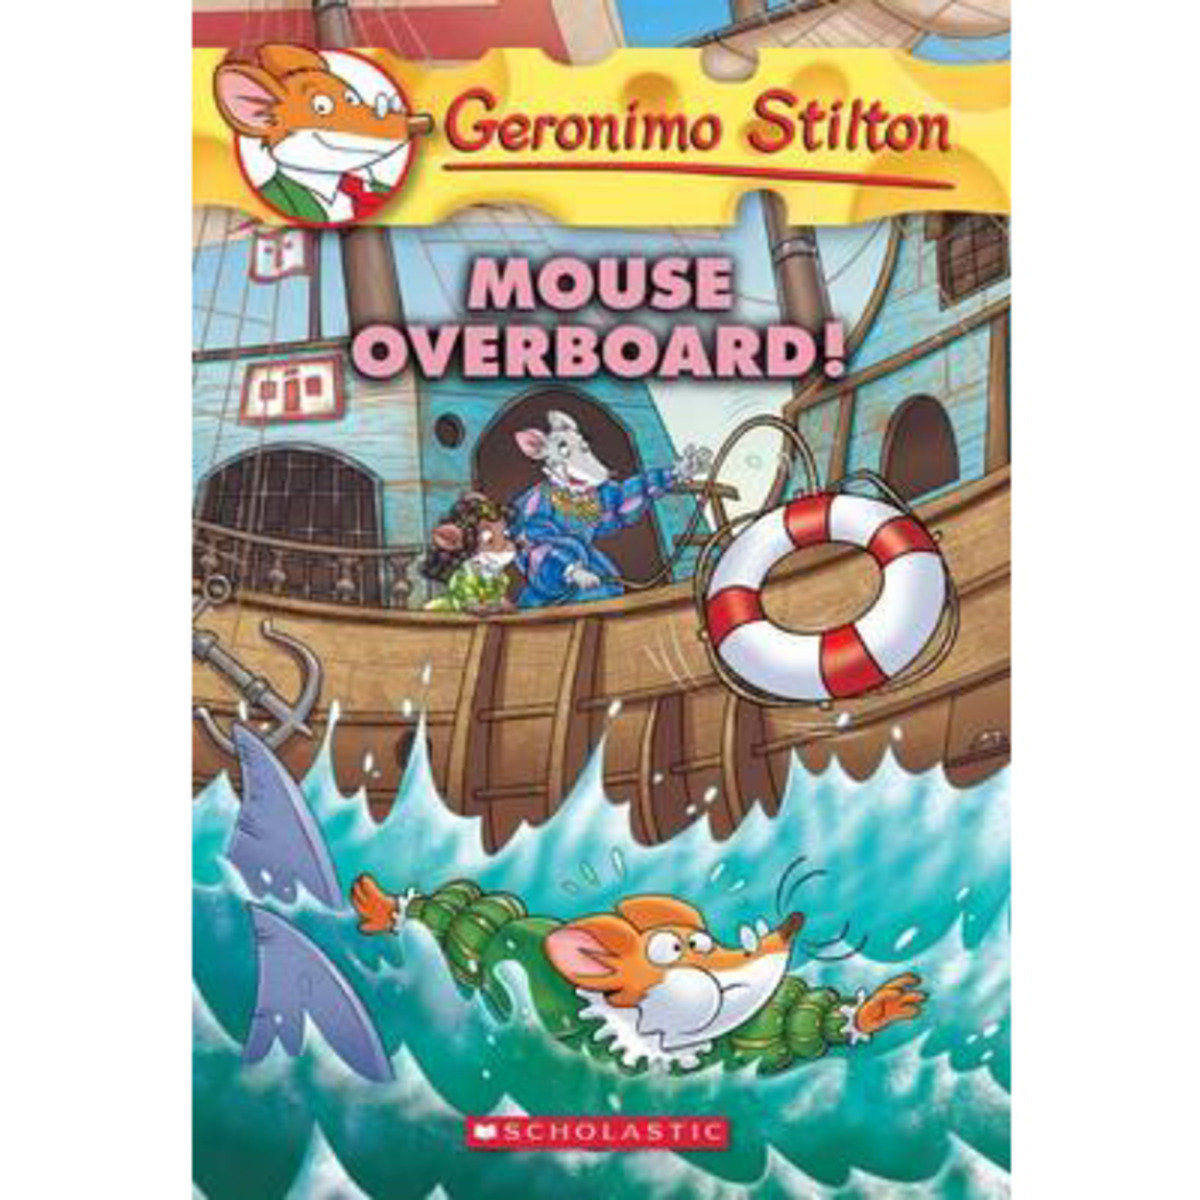 Geronimo Stilton #62 Mouse Overboard!